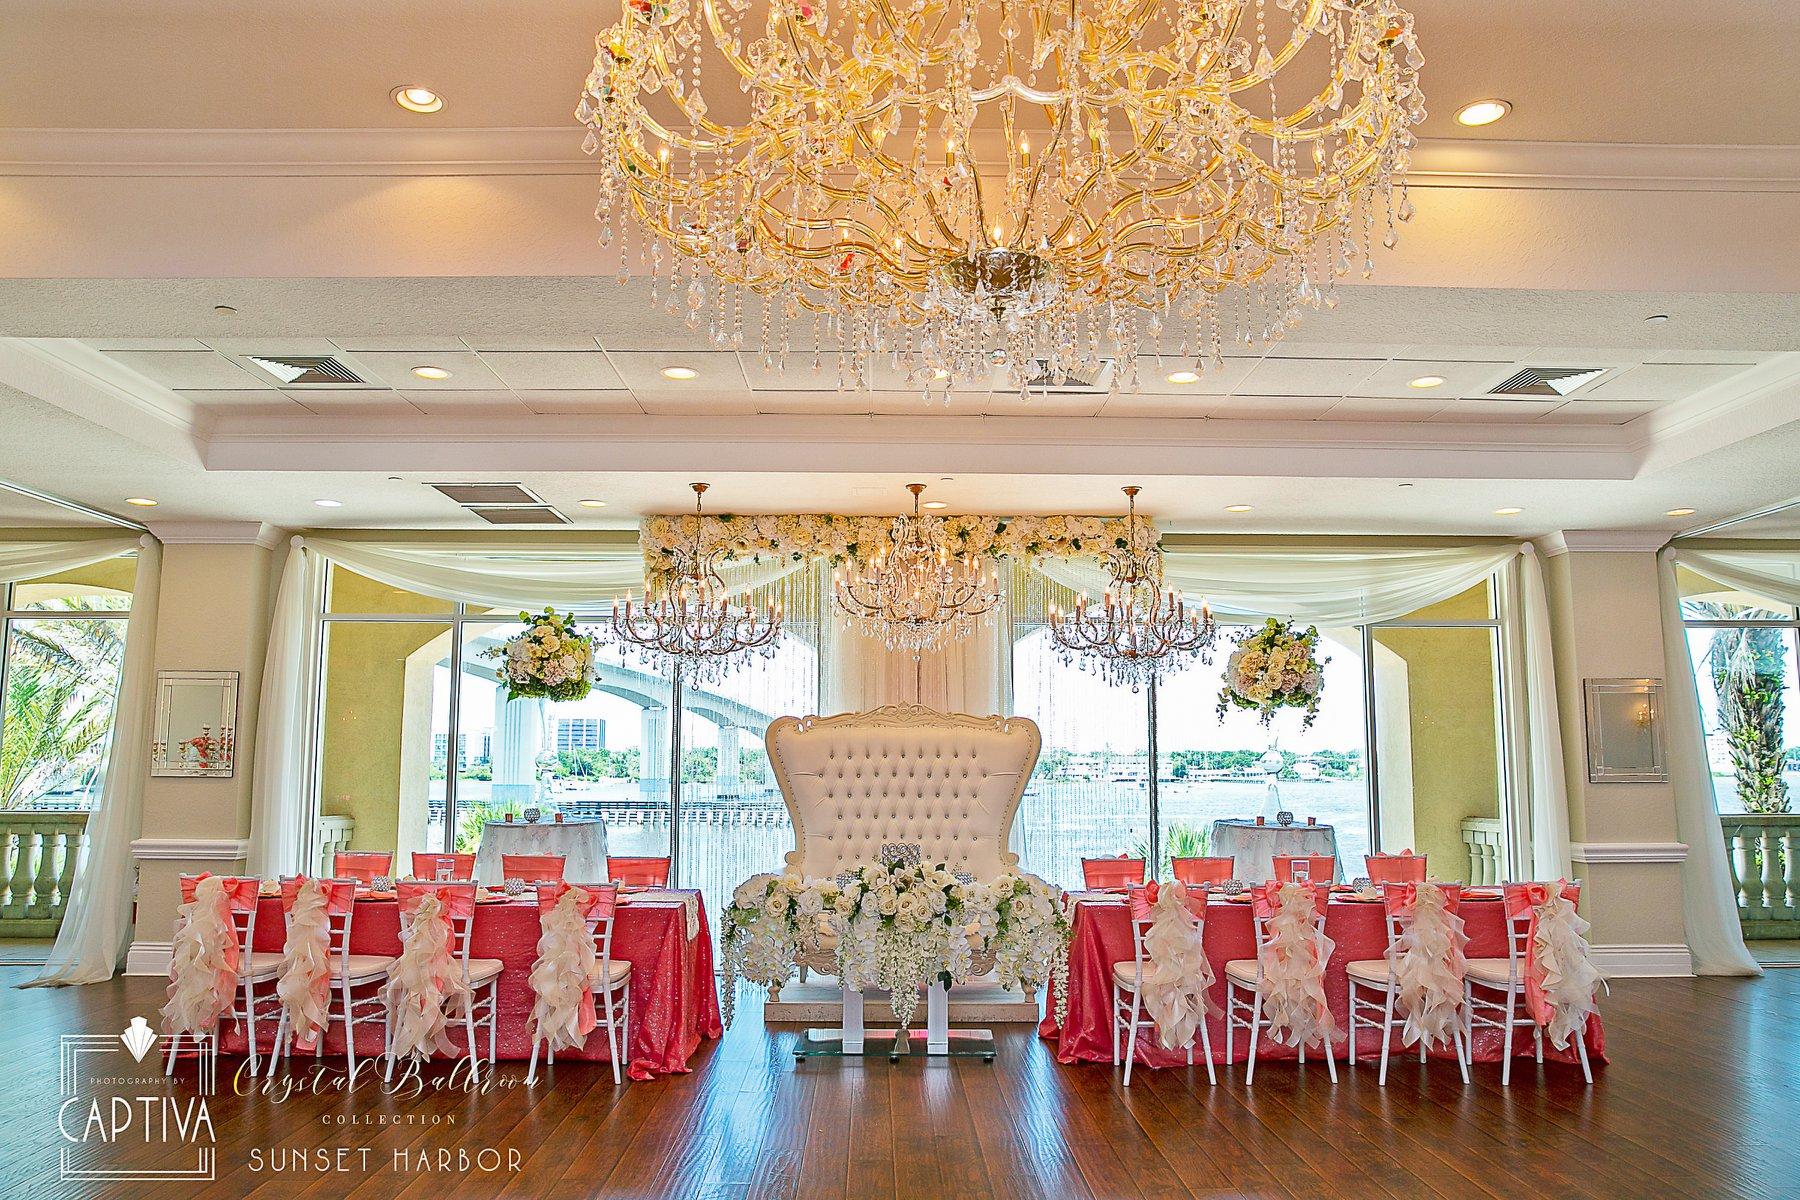 daytona party venue prices book a spot today the crystal ballroom